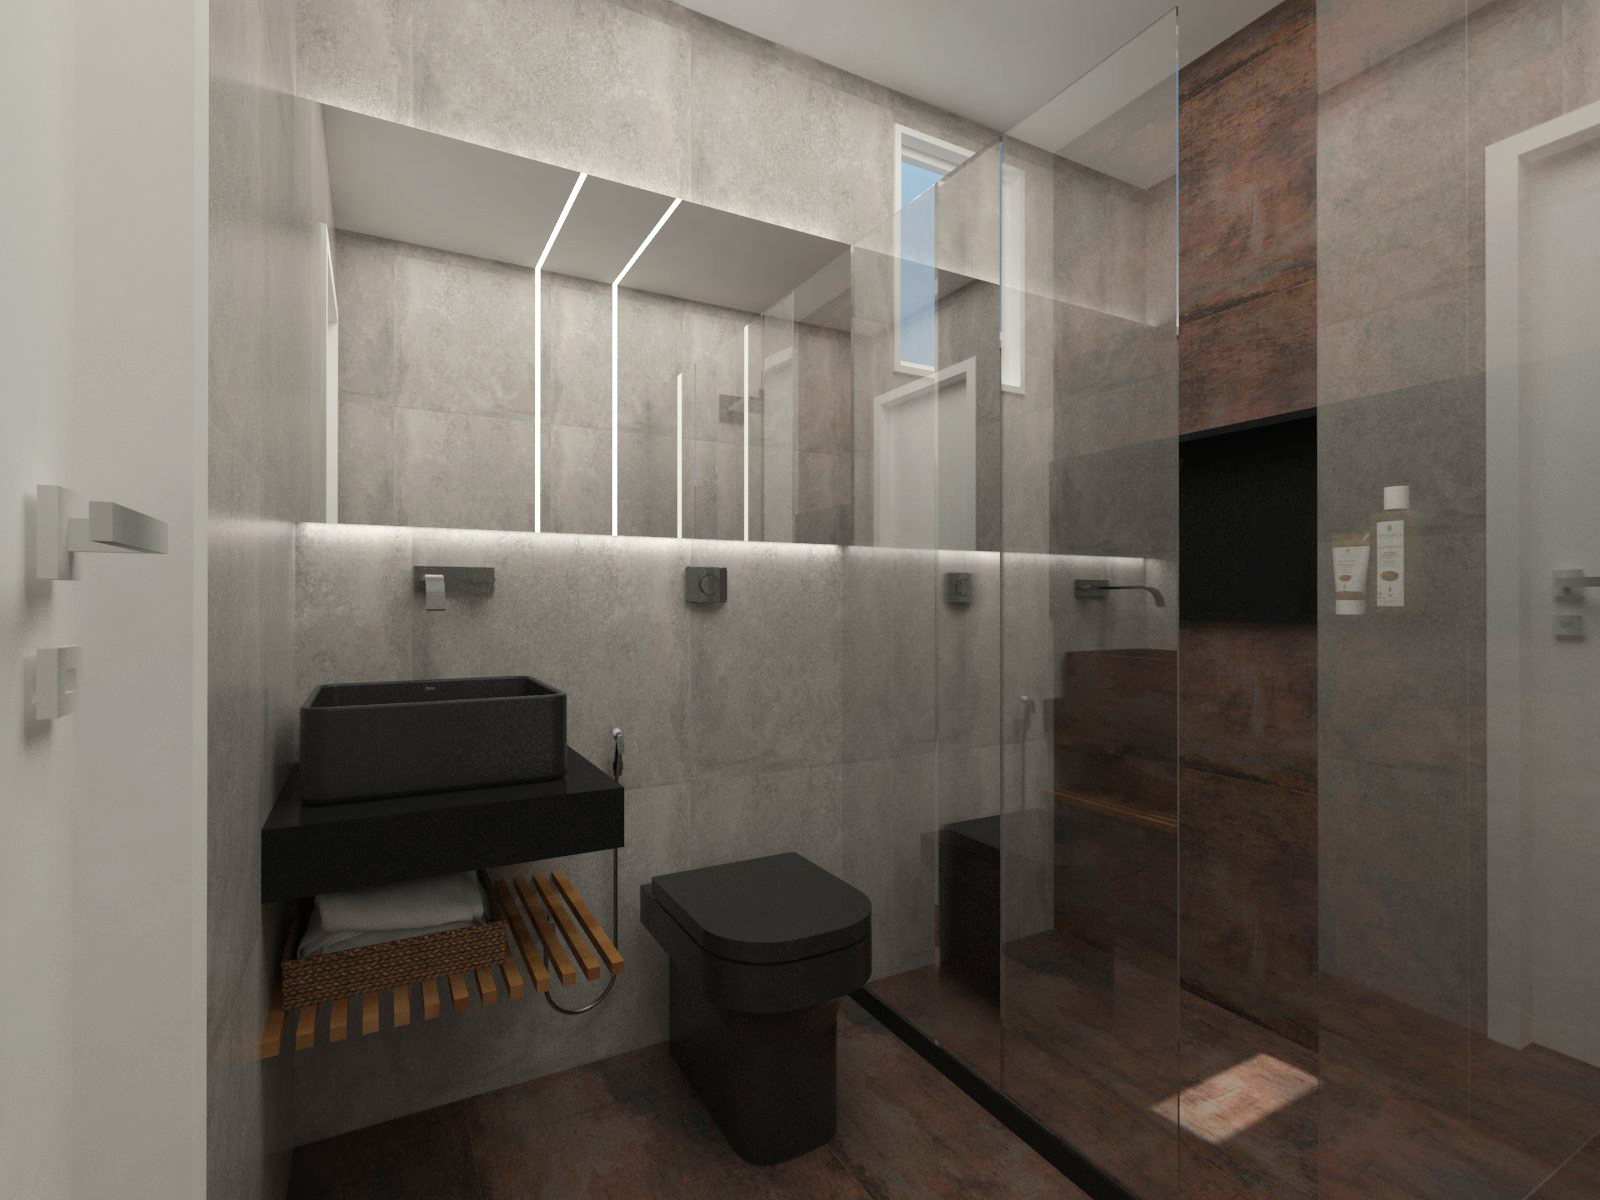 Banheiro Piscina